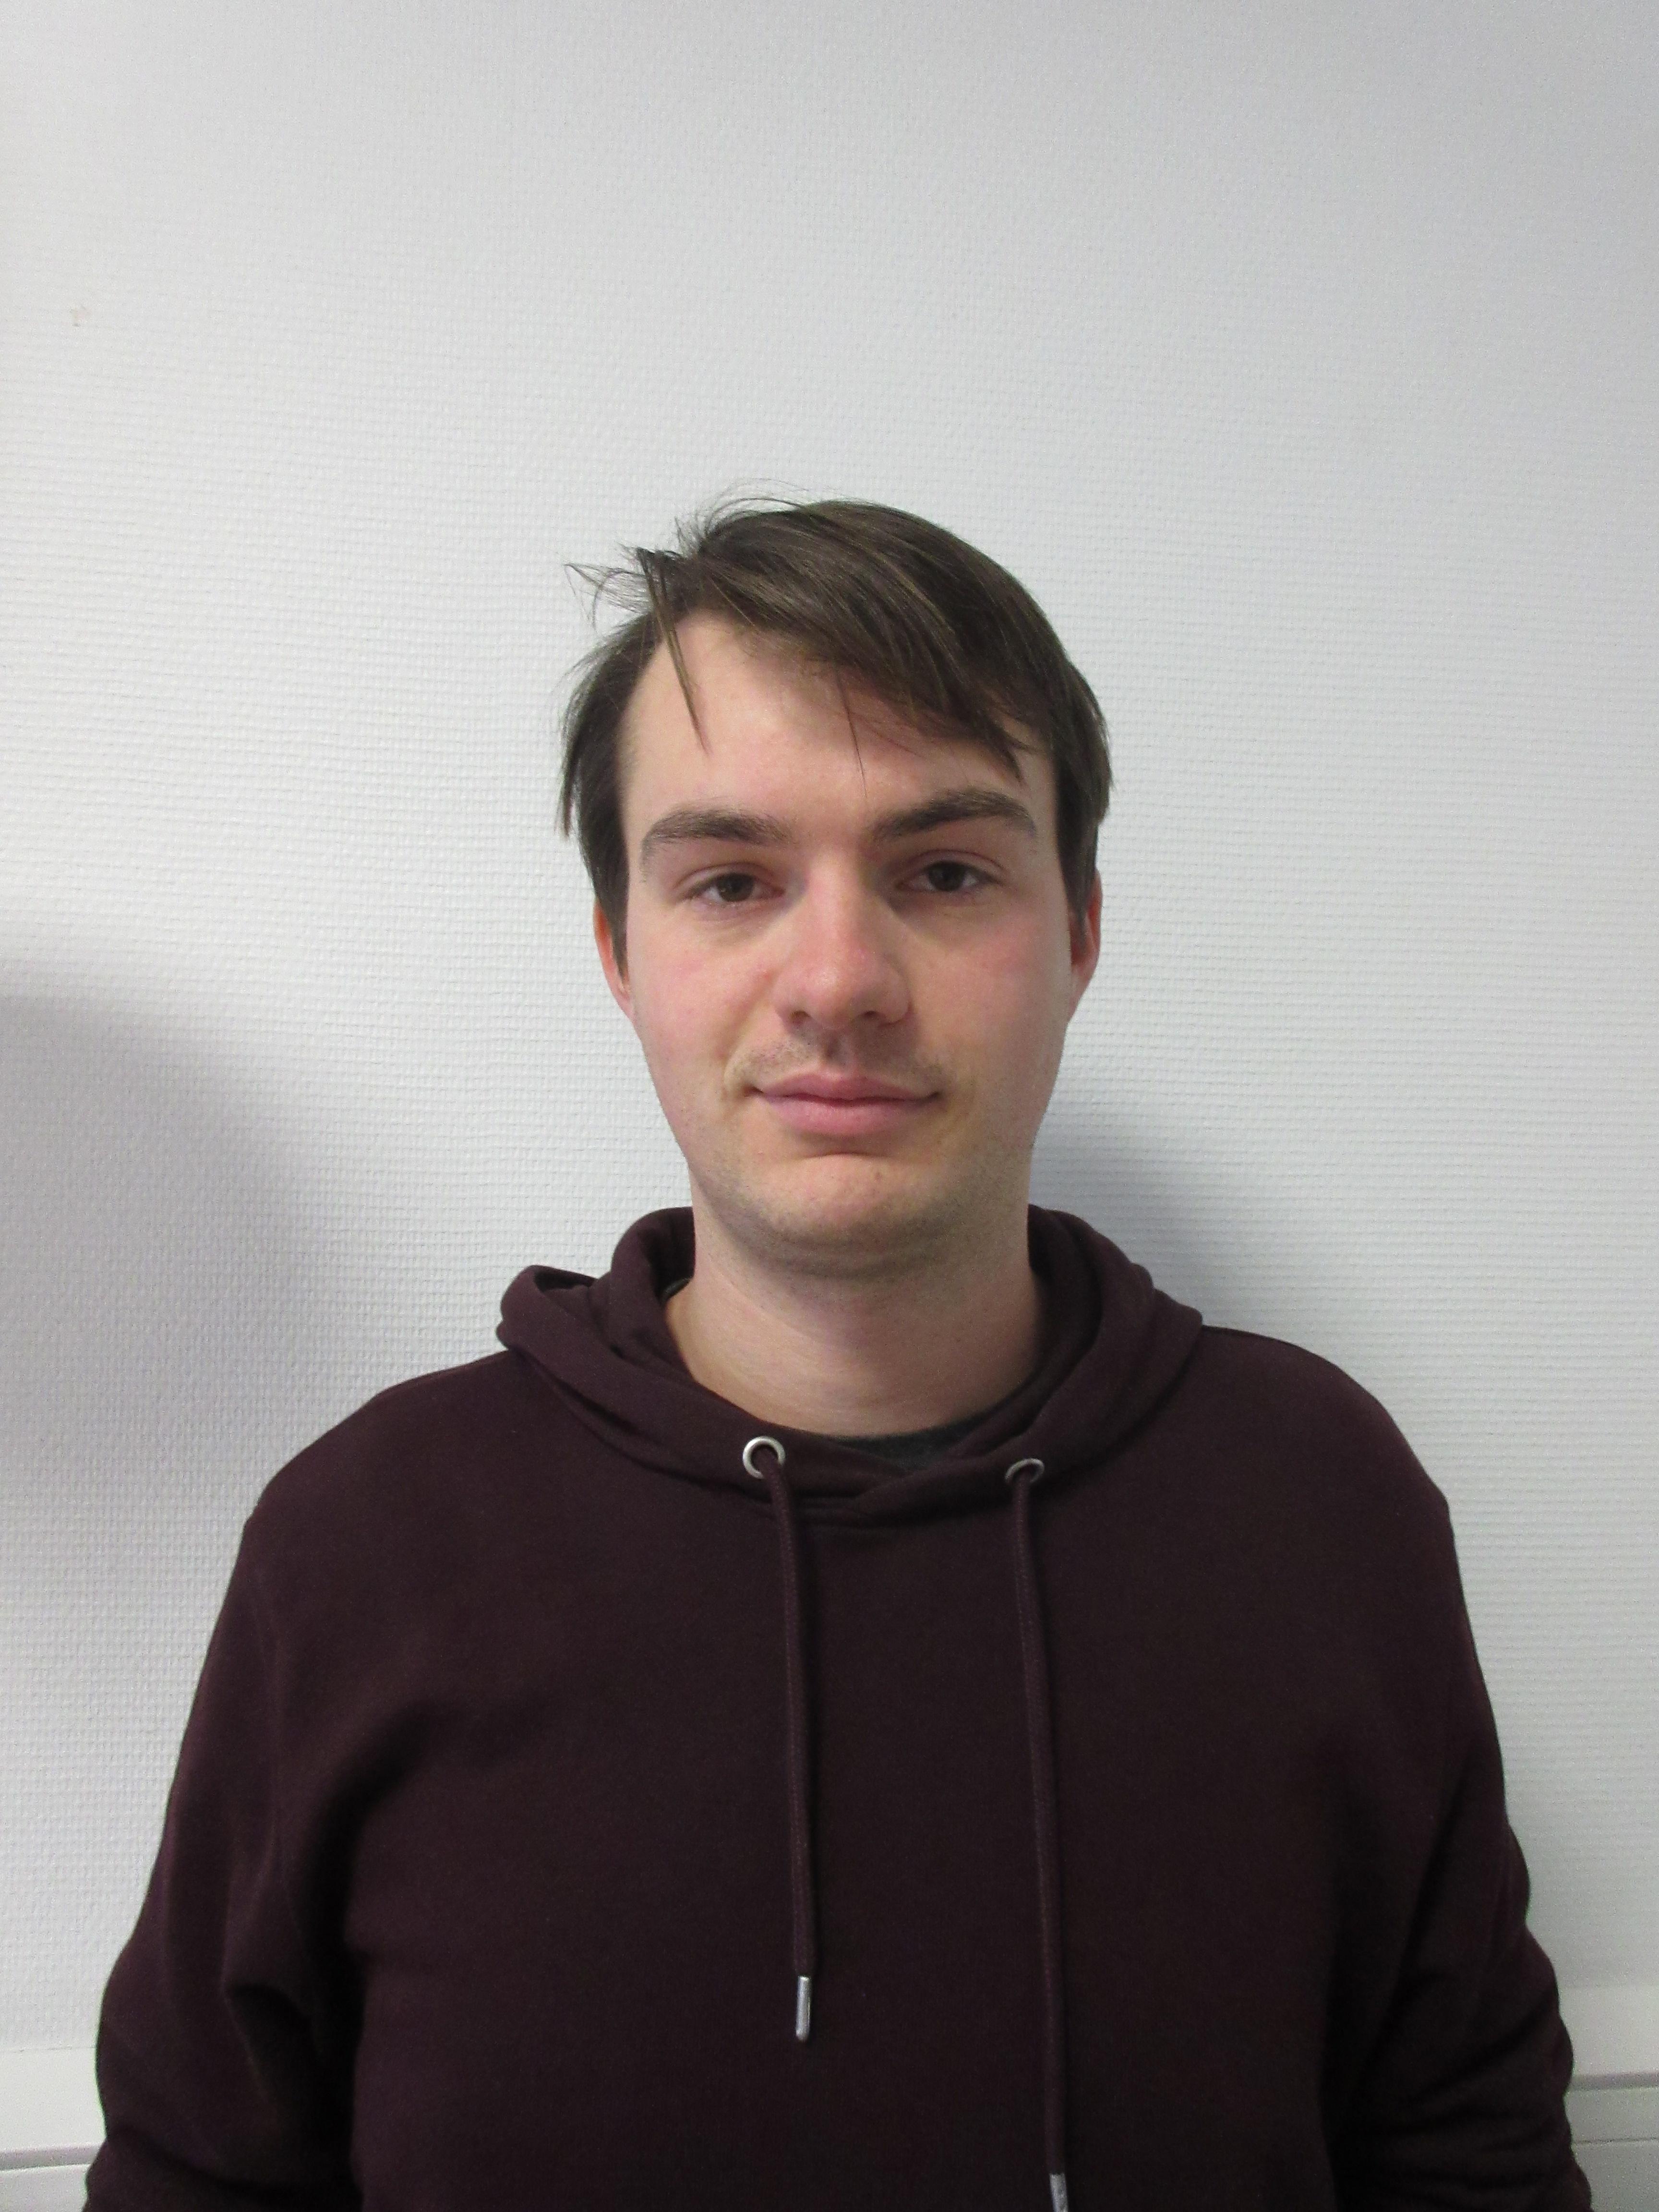 Picture of Boris Vansevenant